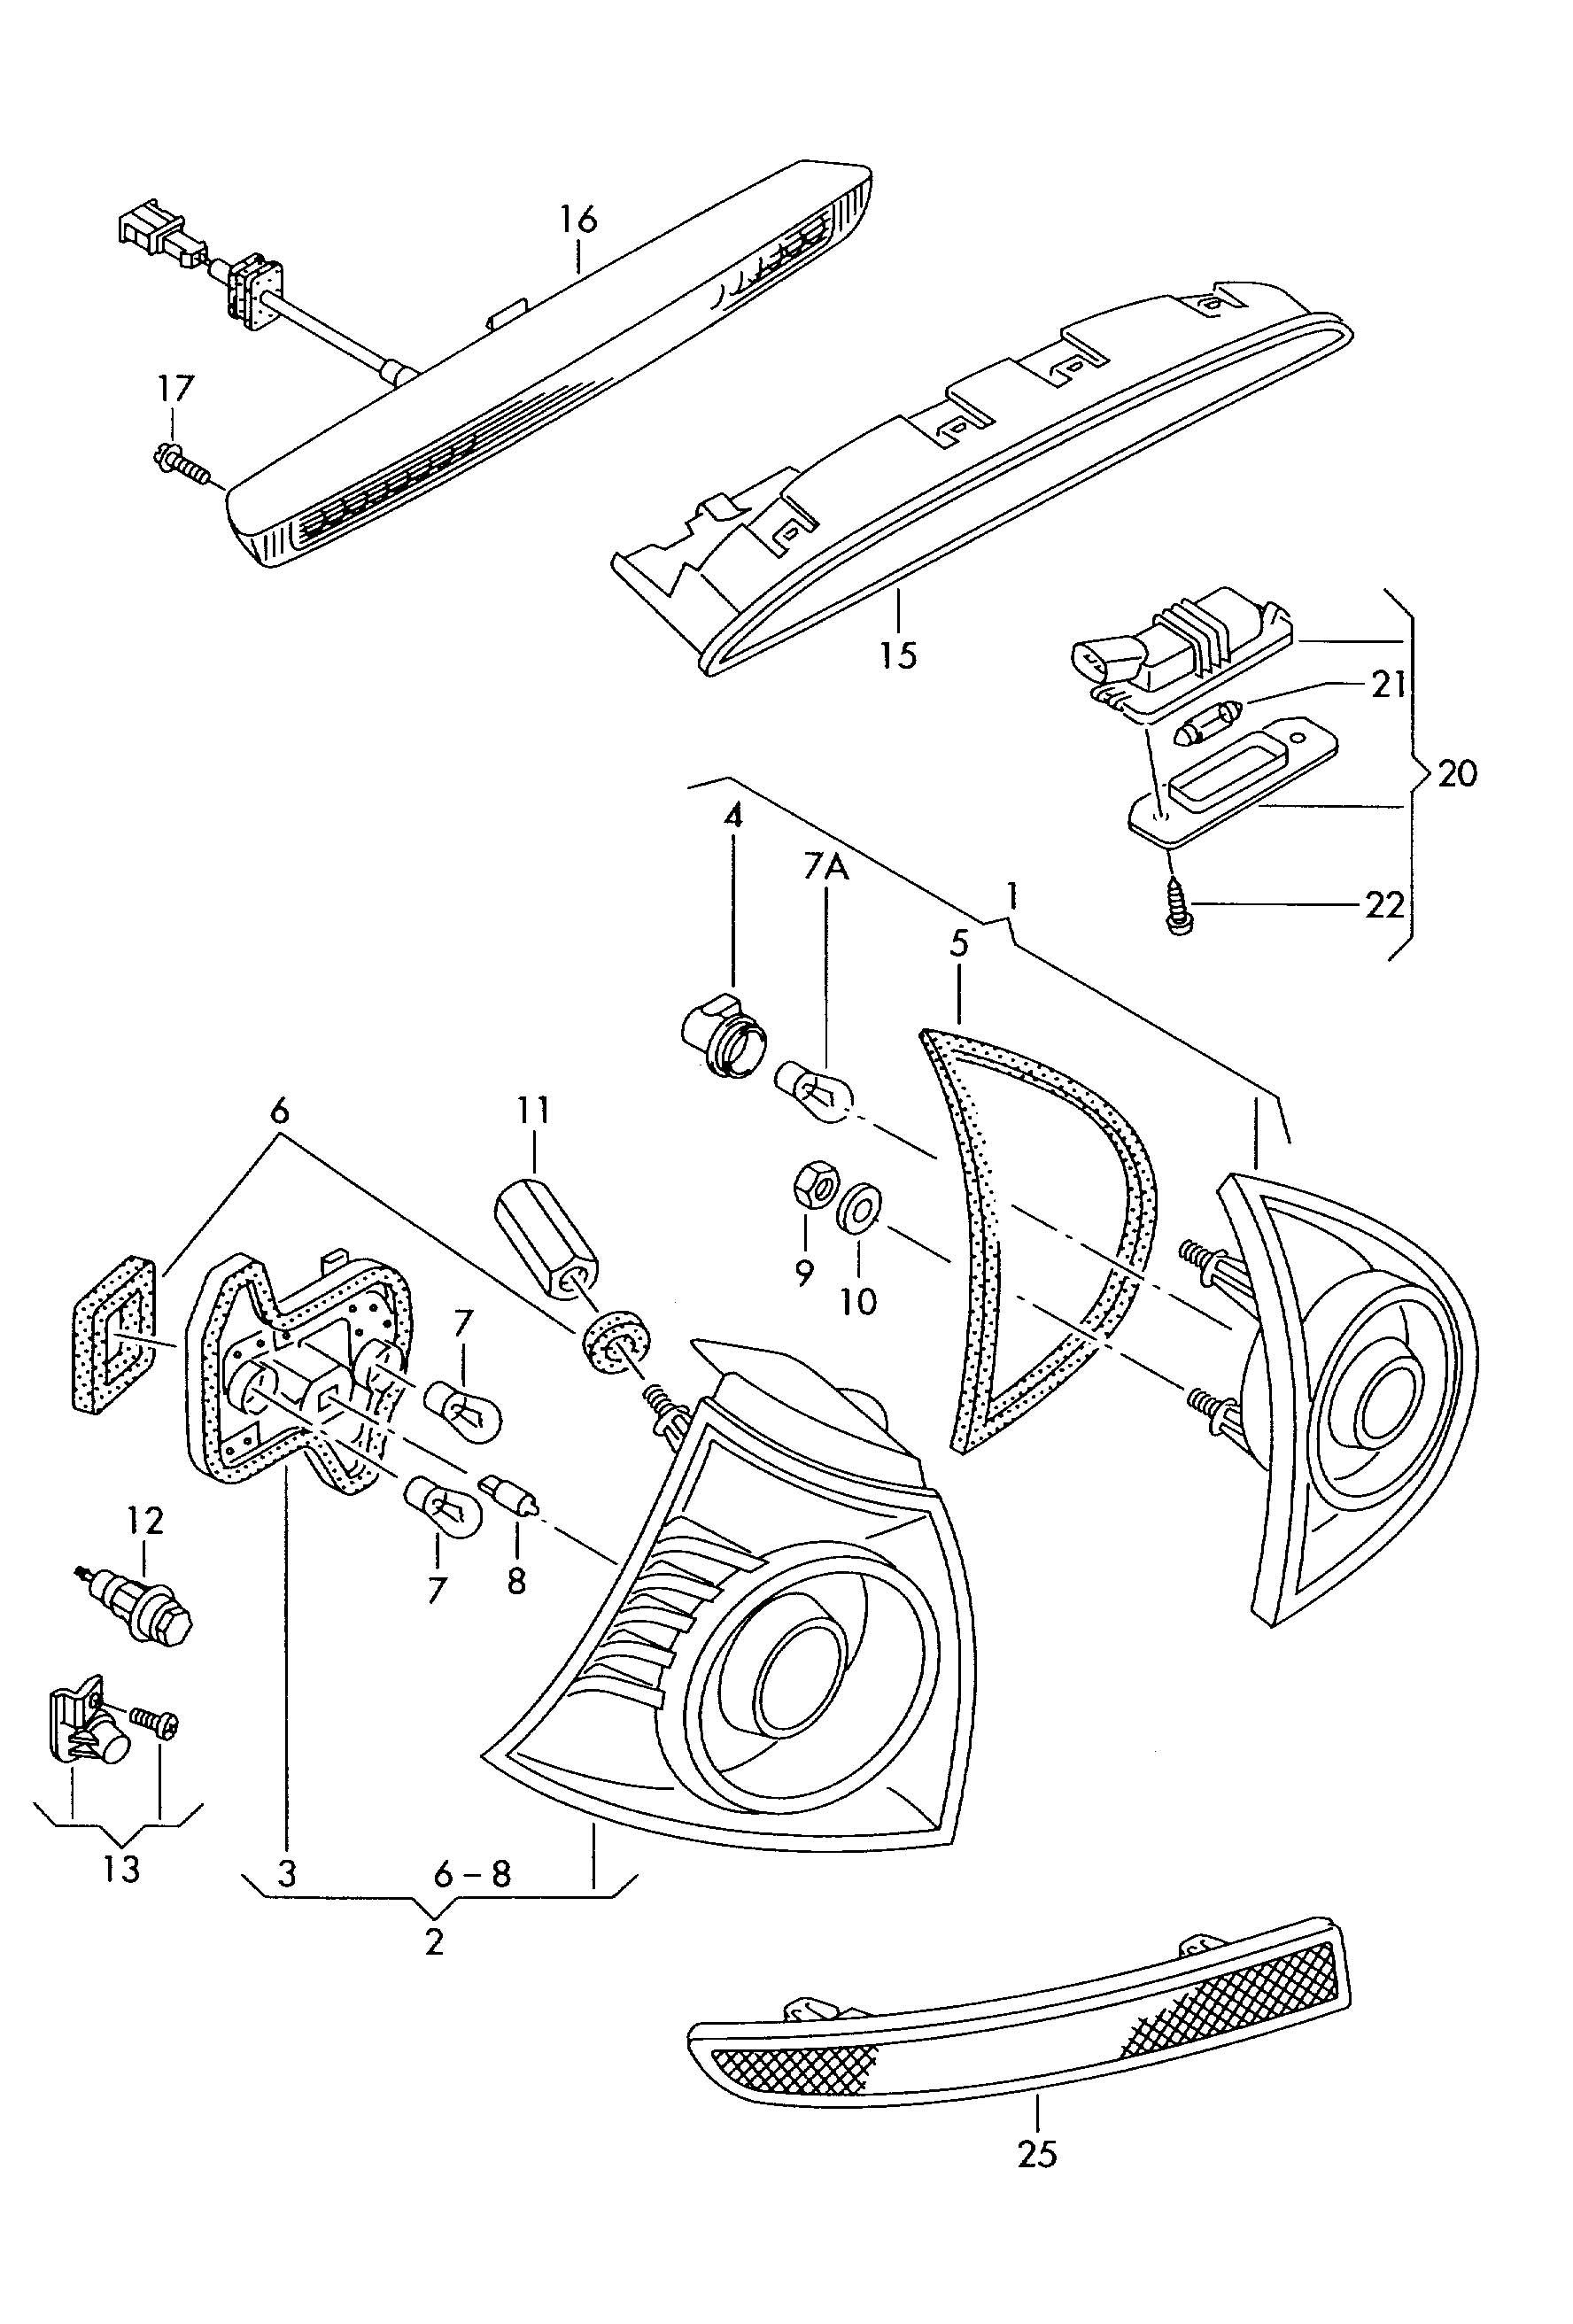 Volkswagen Golf License plate light. LICENCE PLATE LIGHT